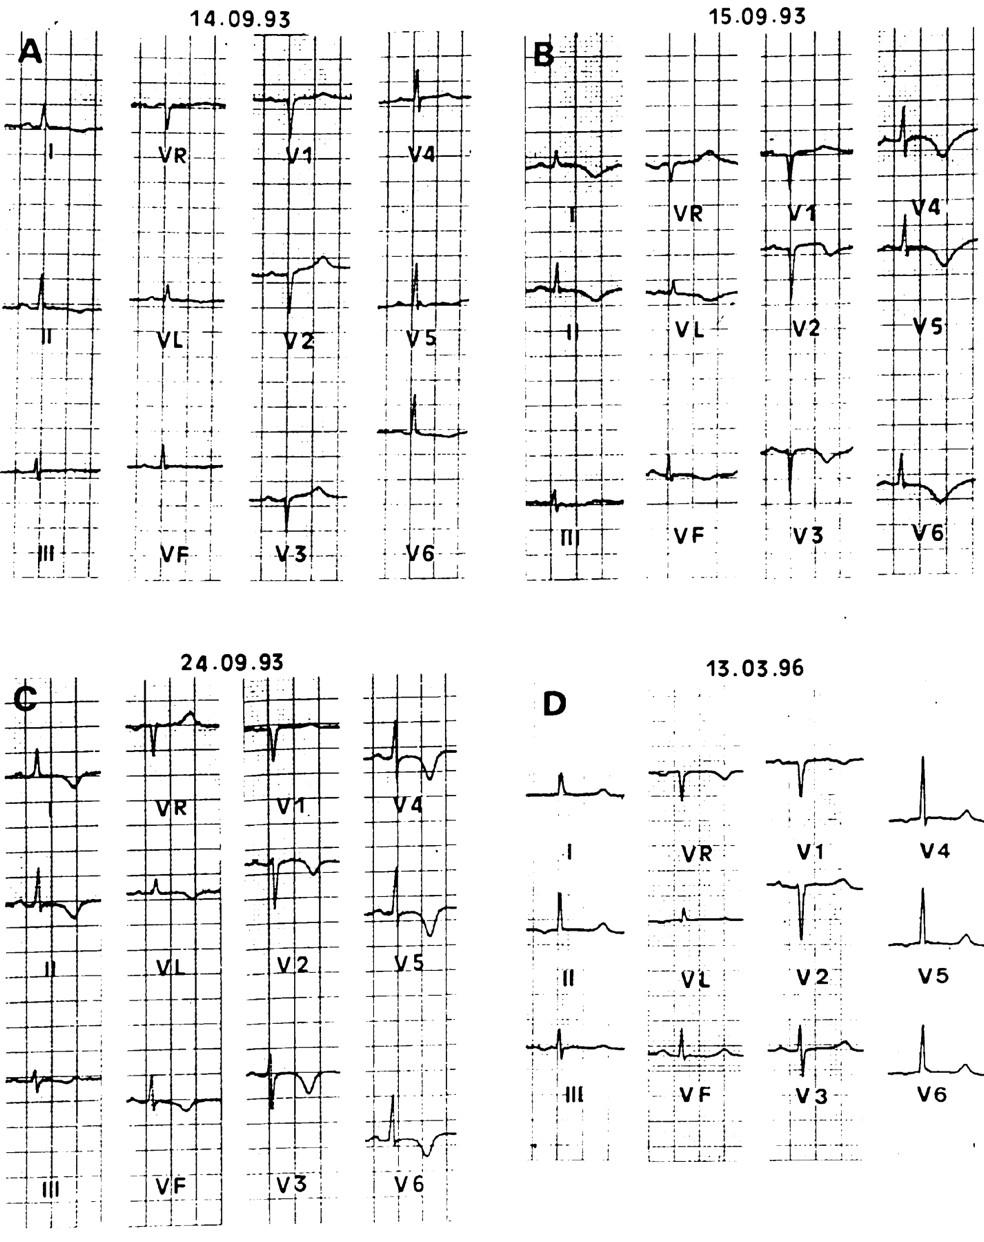 Human stress cardiomyopathy mimicking acute myocardial